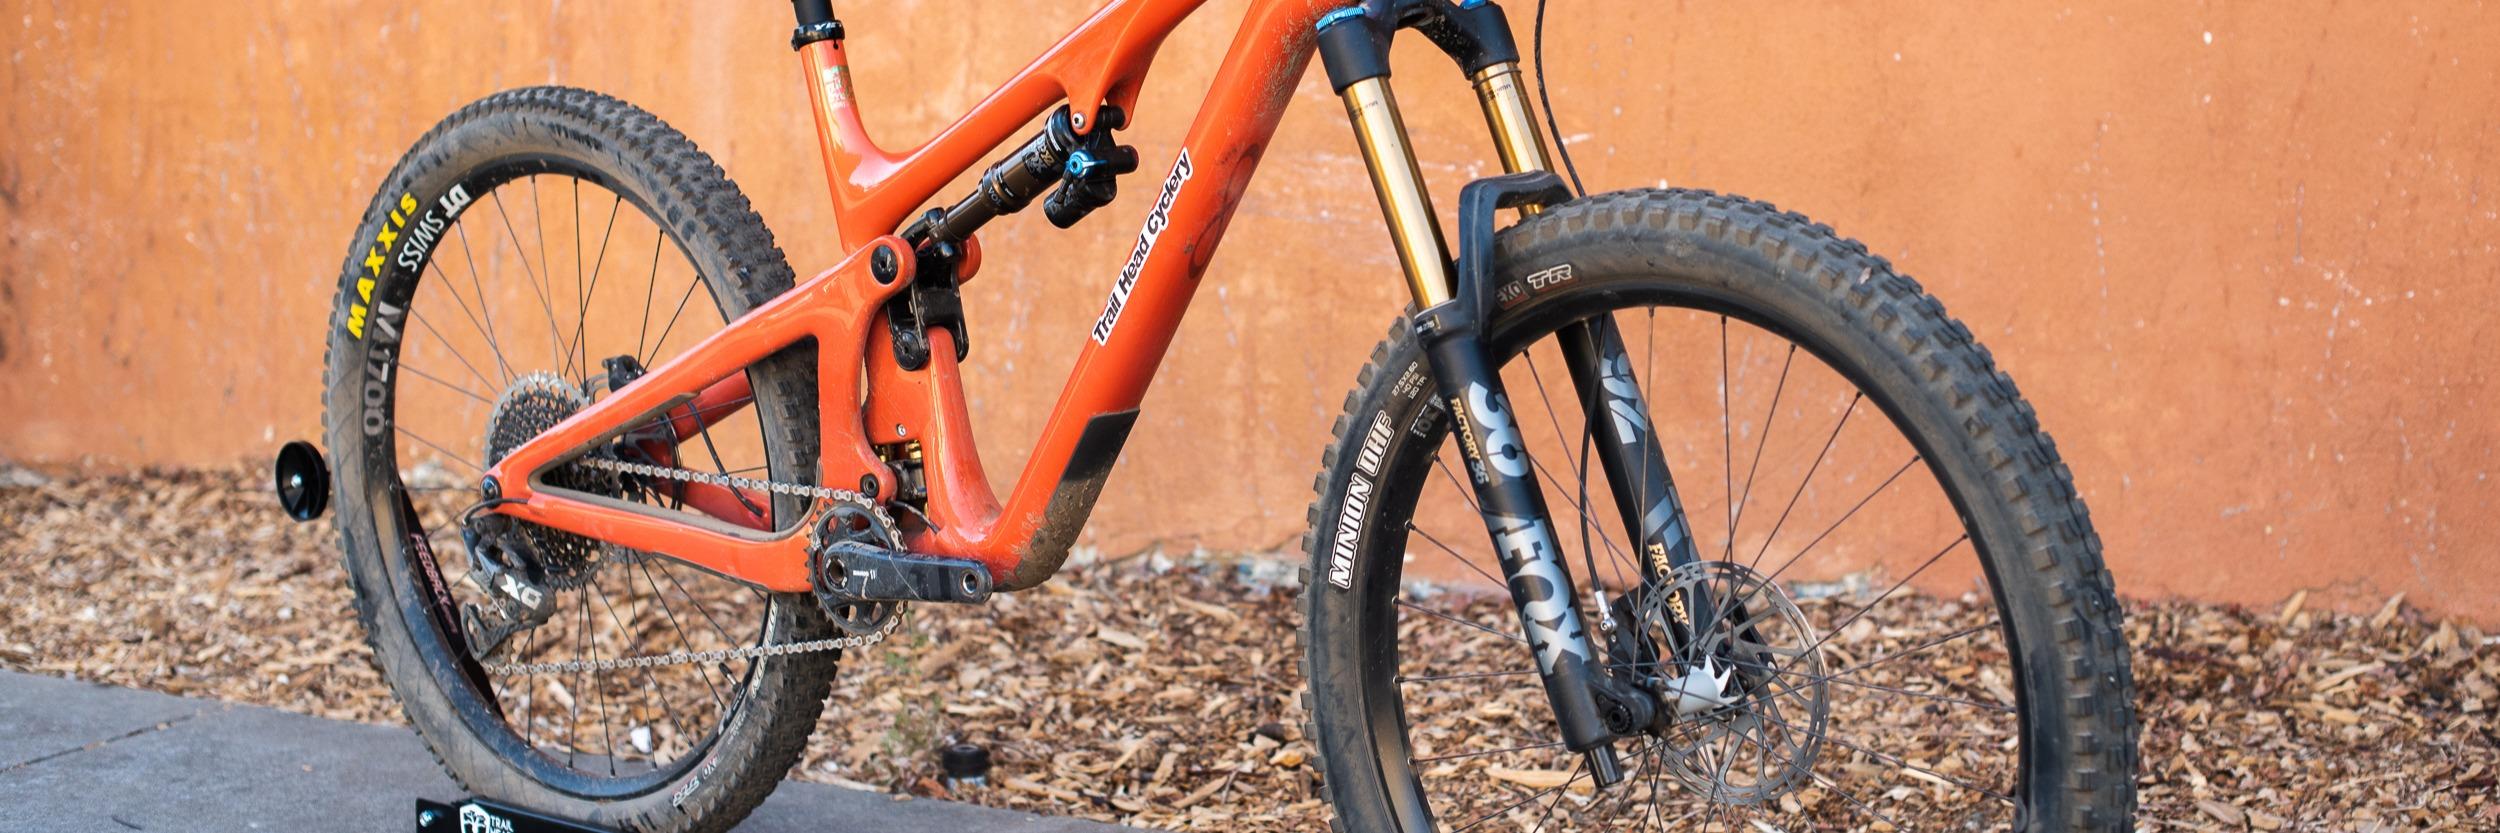 Yeti SB140 rental mountain bike from trail head cyclery